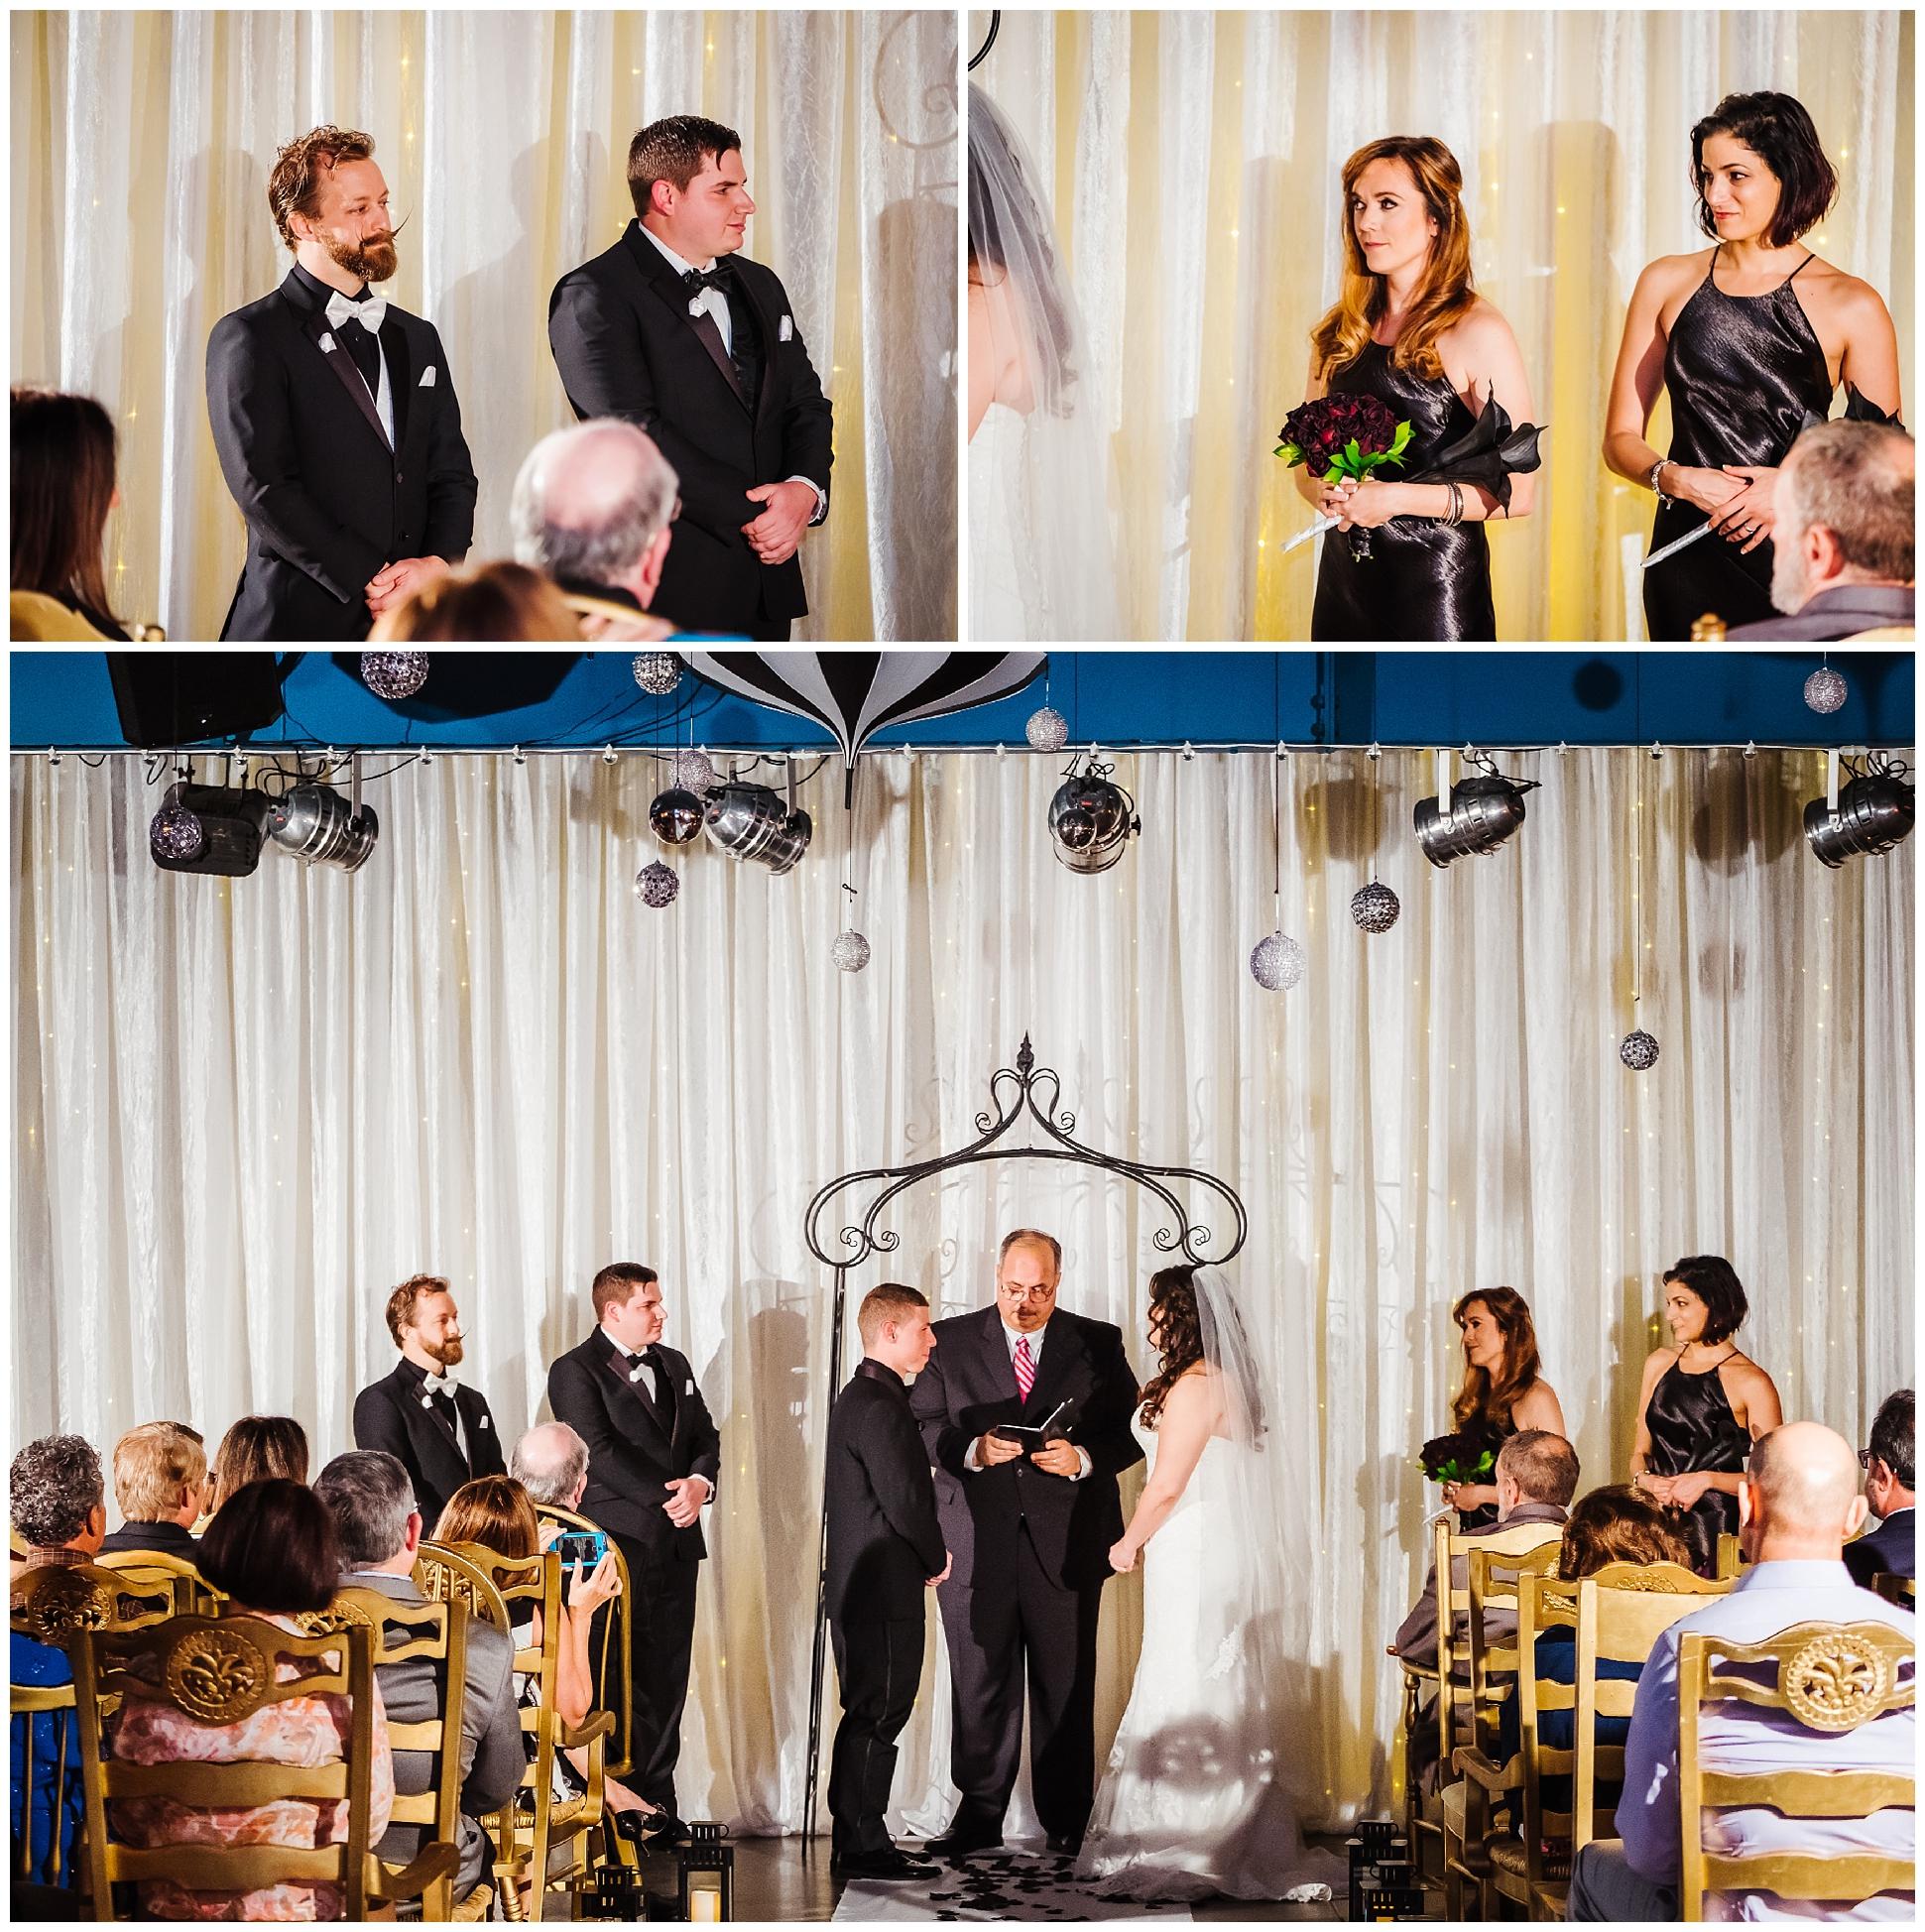 tampa-wedding-photographer-unique-indoor-venue_0025.jpg